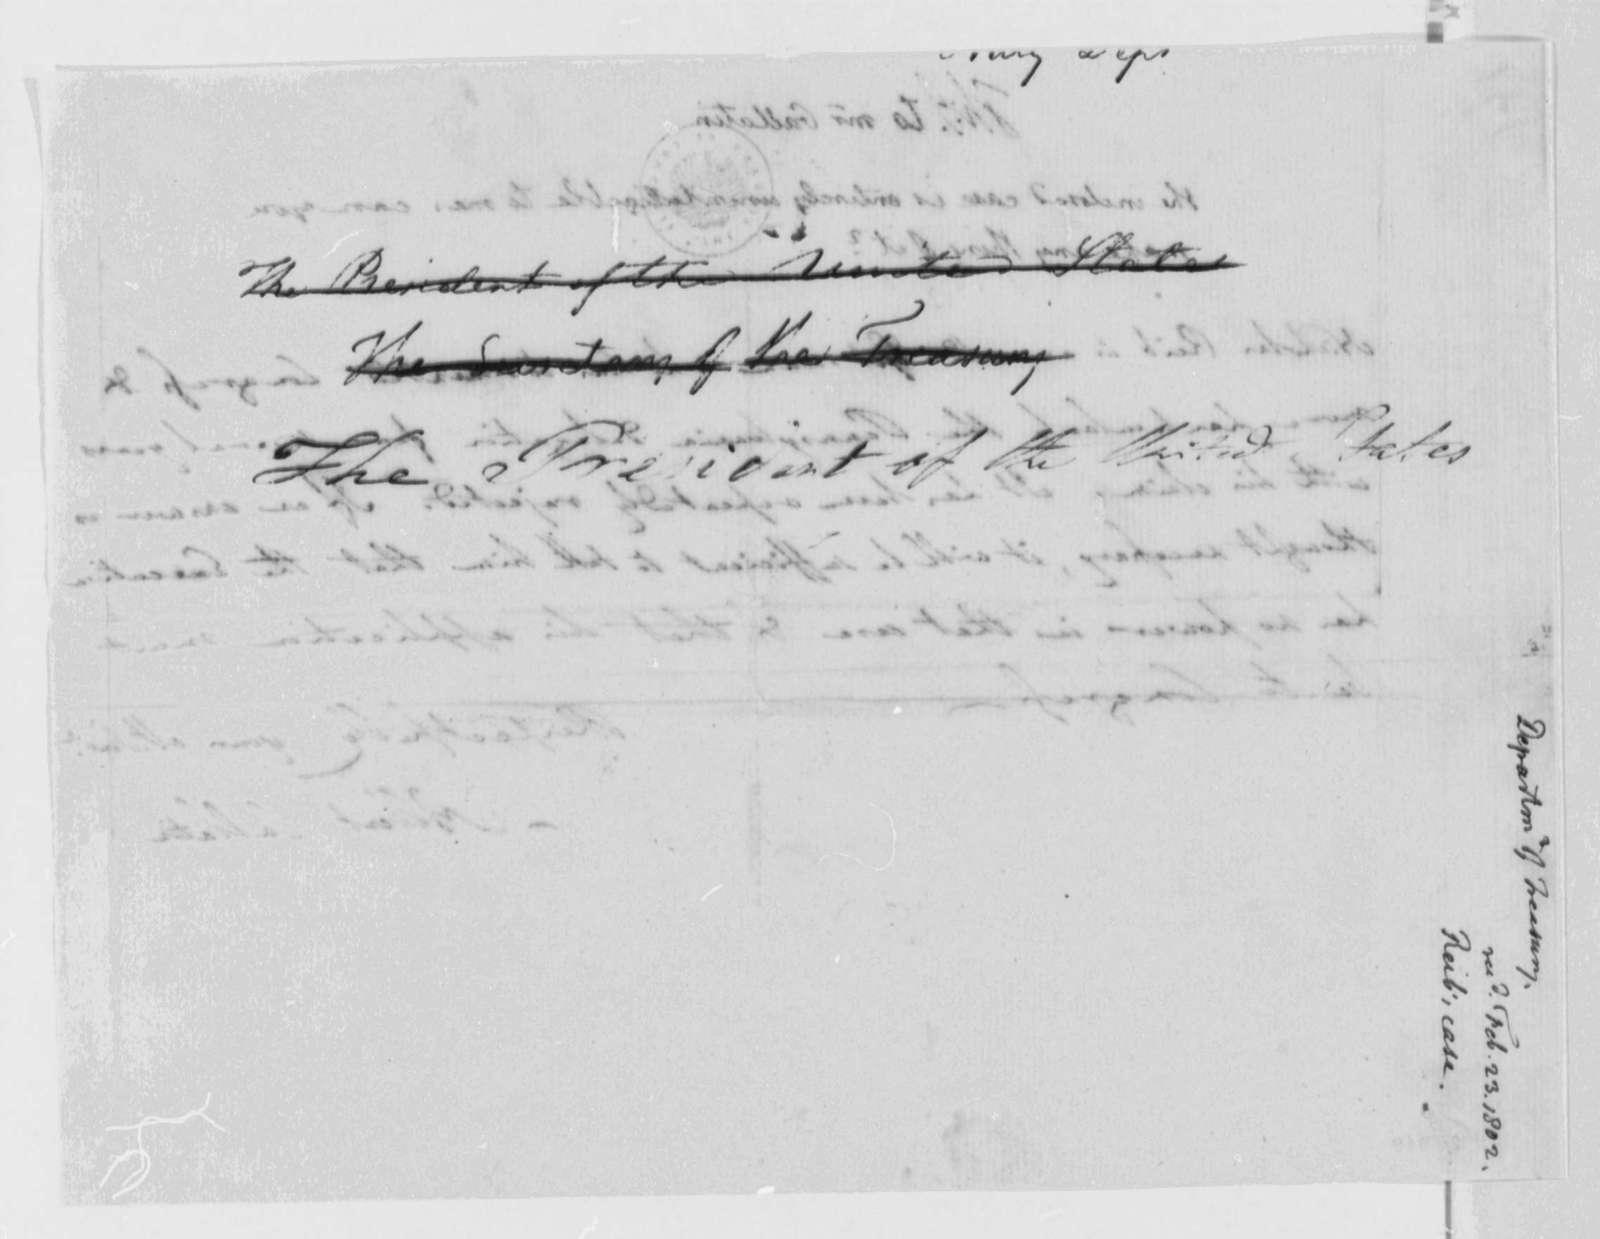 Thomas Jefferson to Albert Gallatin, February 23, 1802